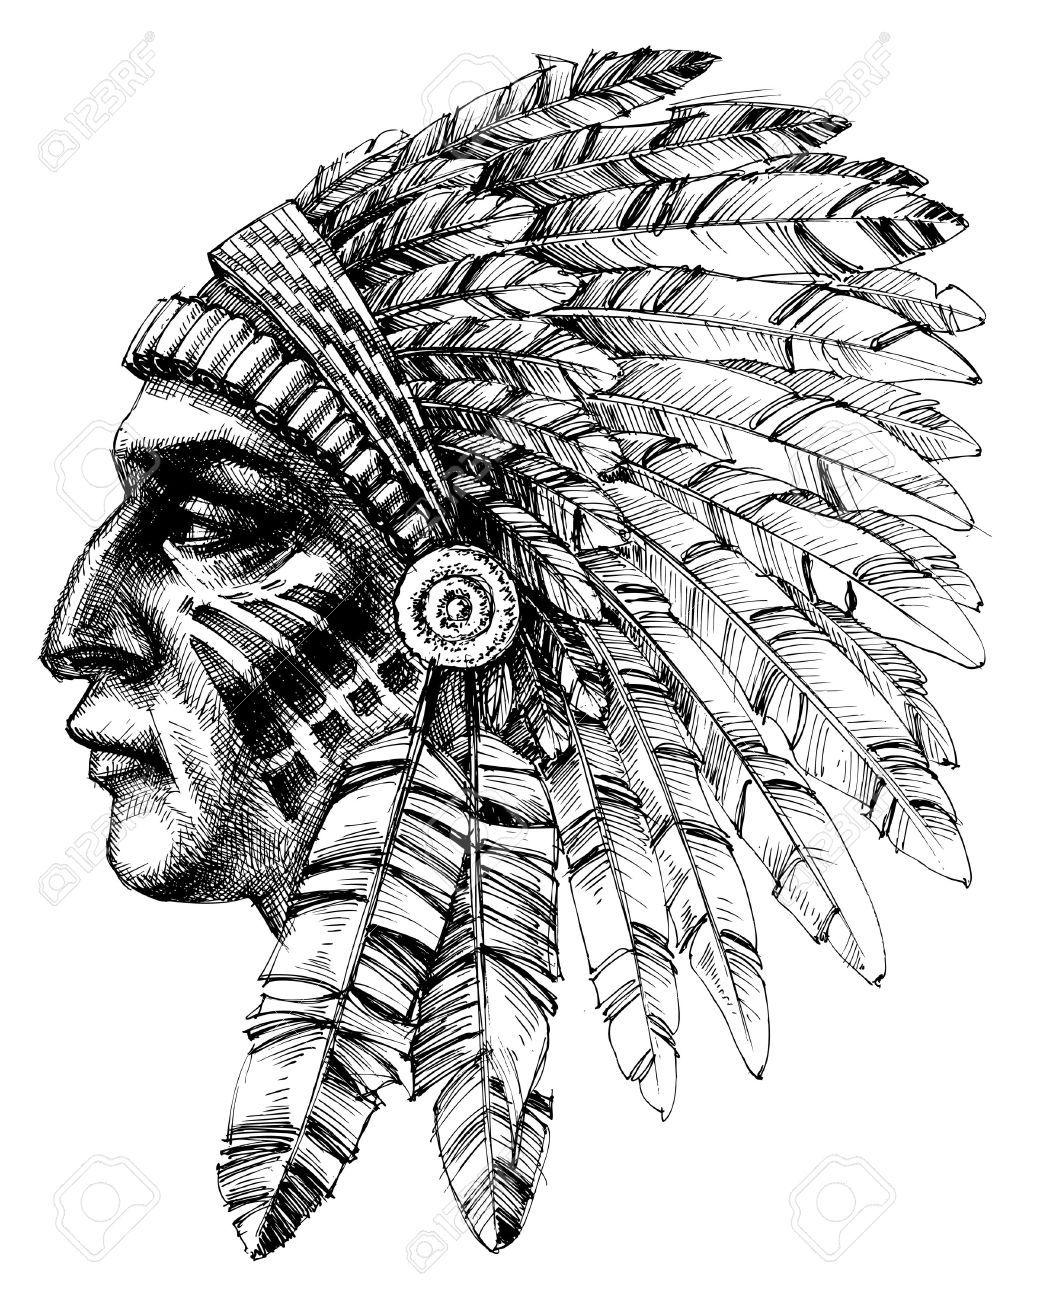 Immagine Correlata Indianer Tattoo Indischer Kopfschmuck Tattoo Indianer Kopfschmuck